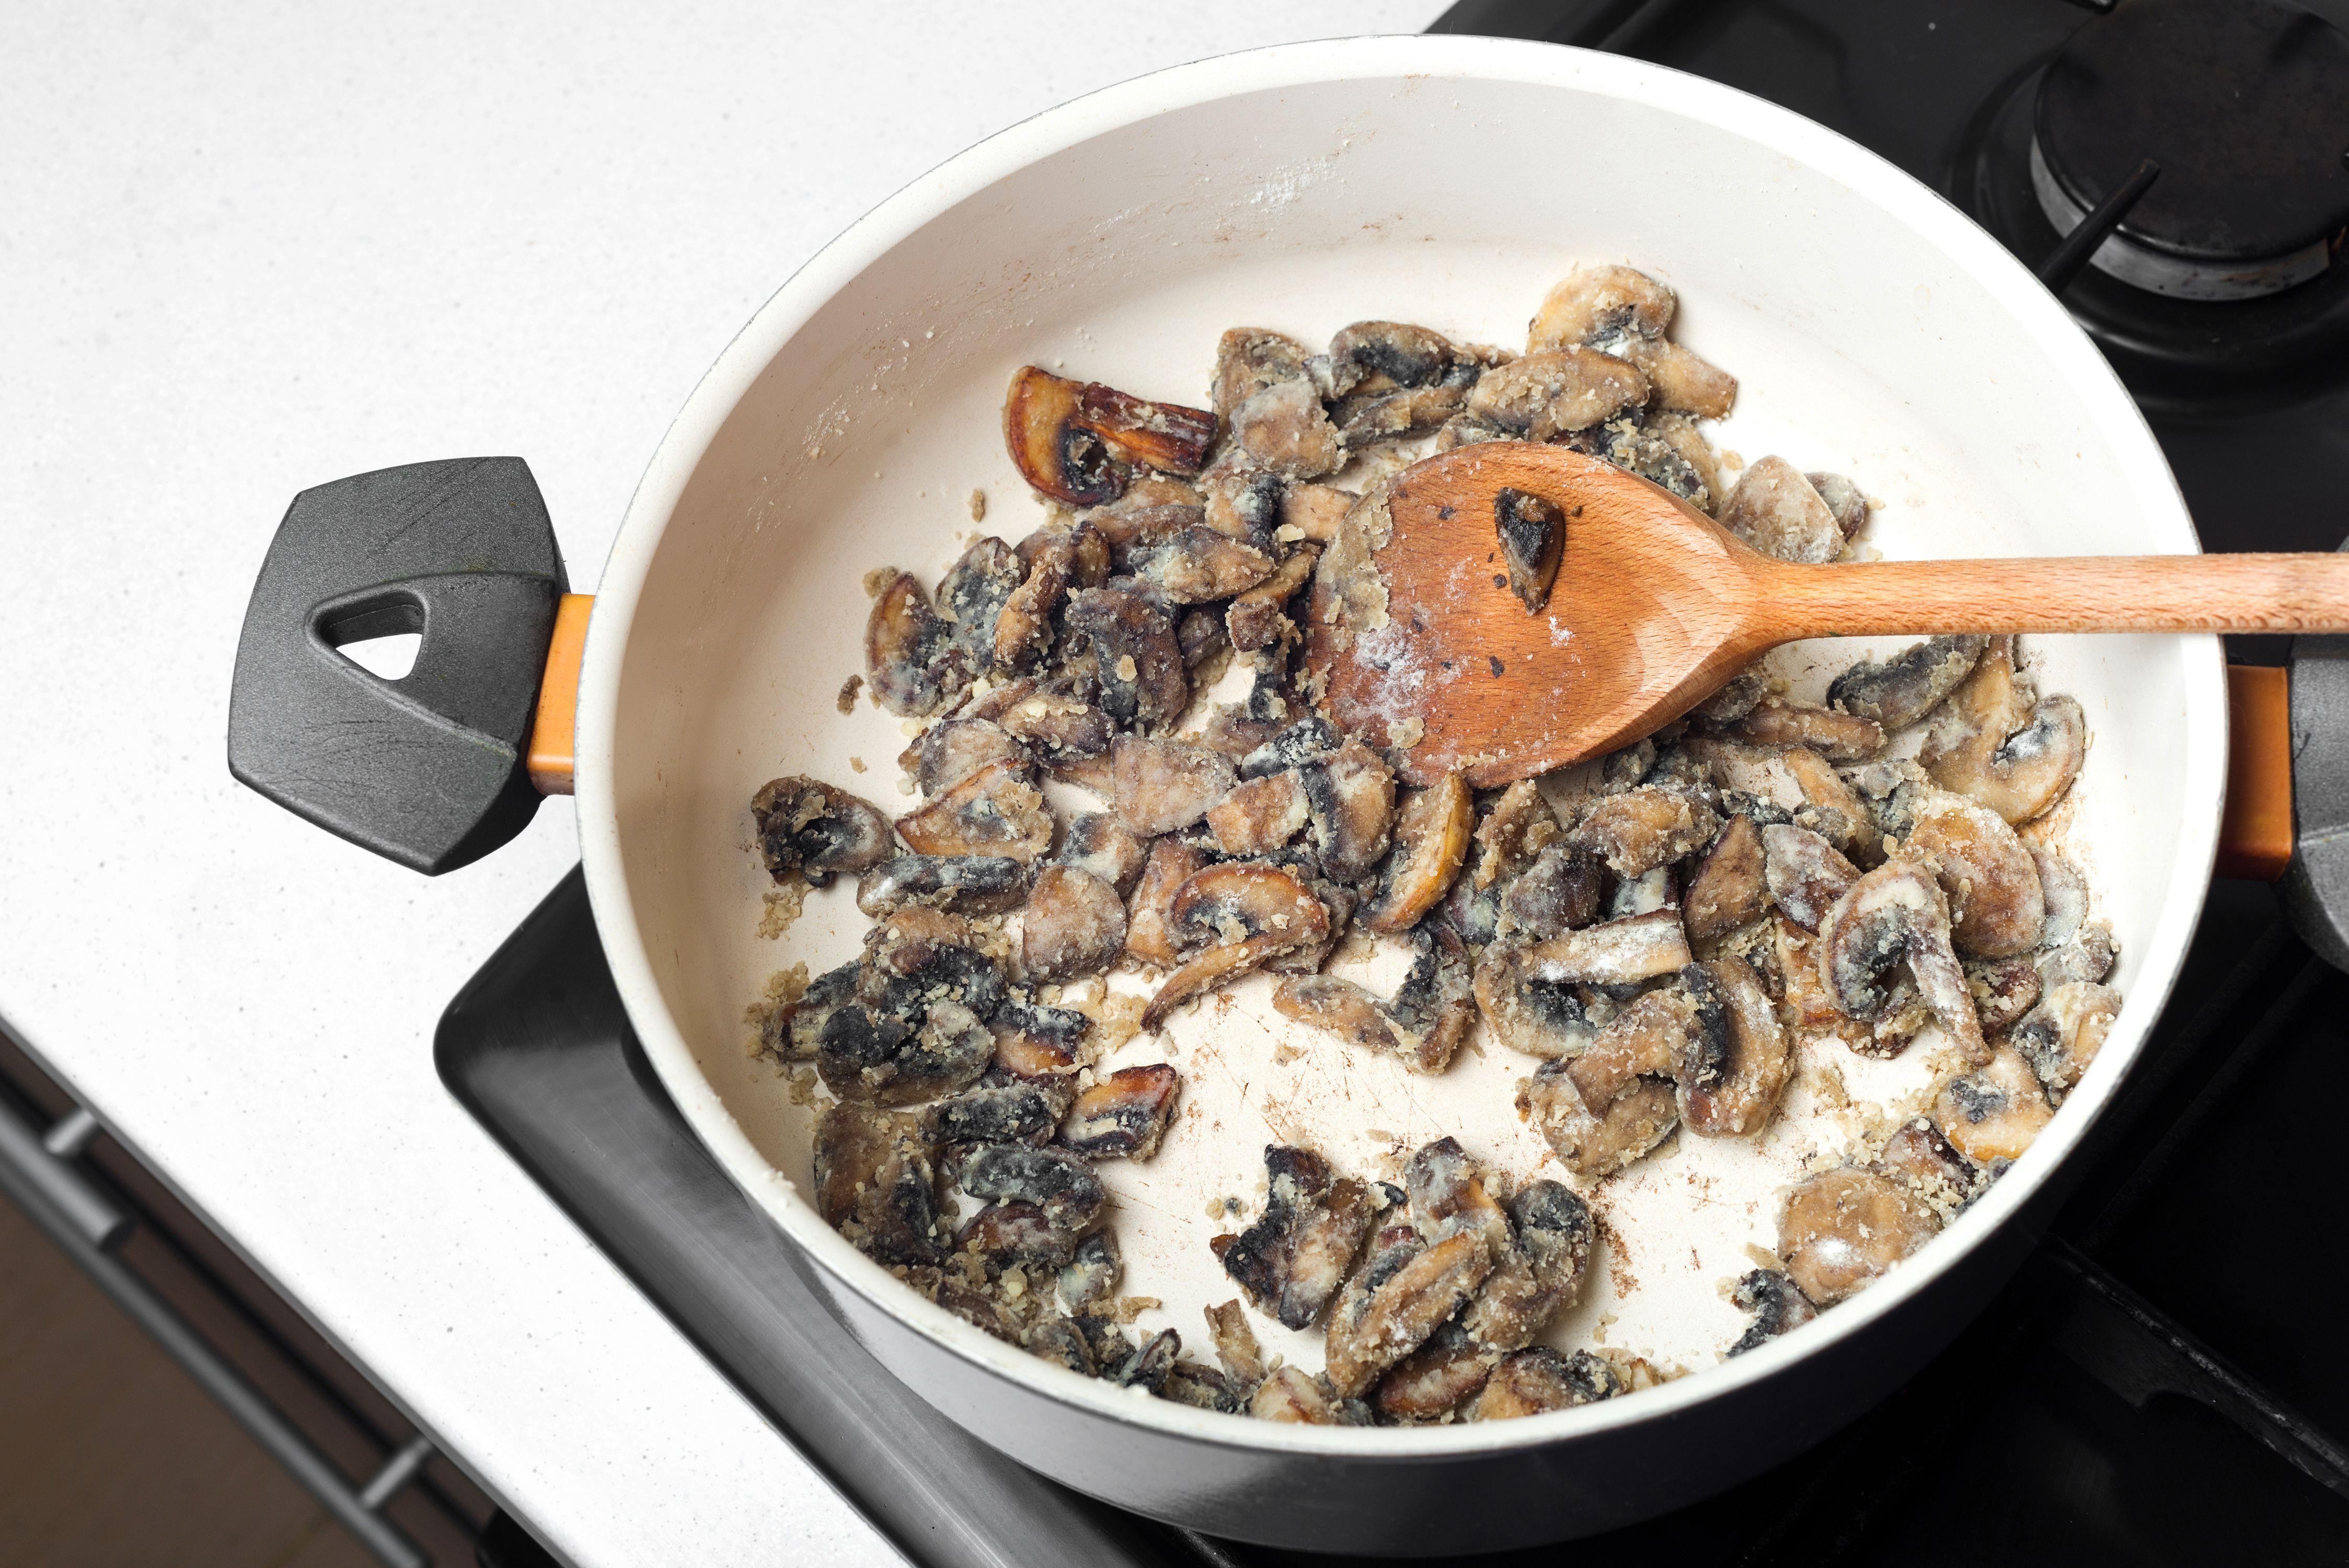 Stir in flour to mushrooms in saucepan